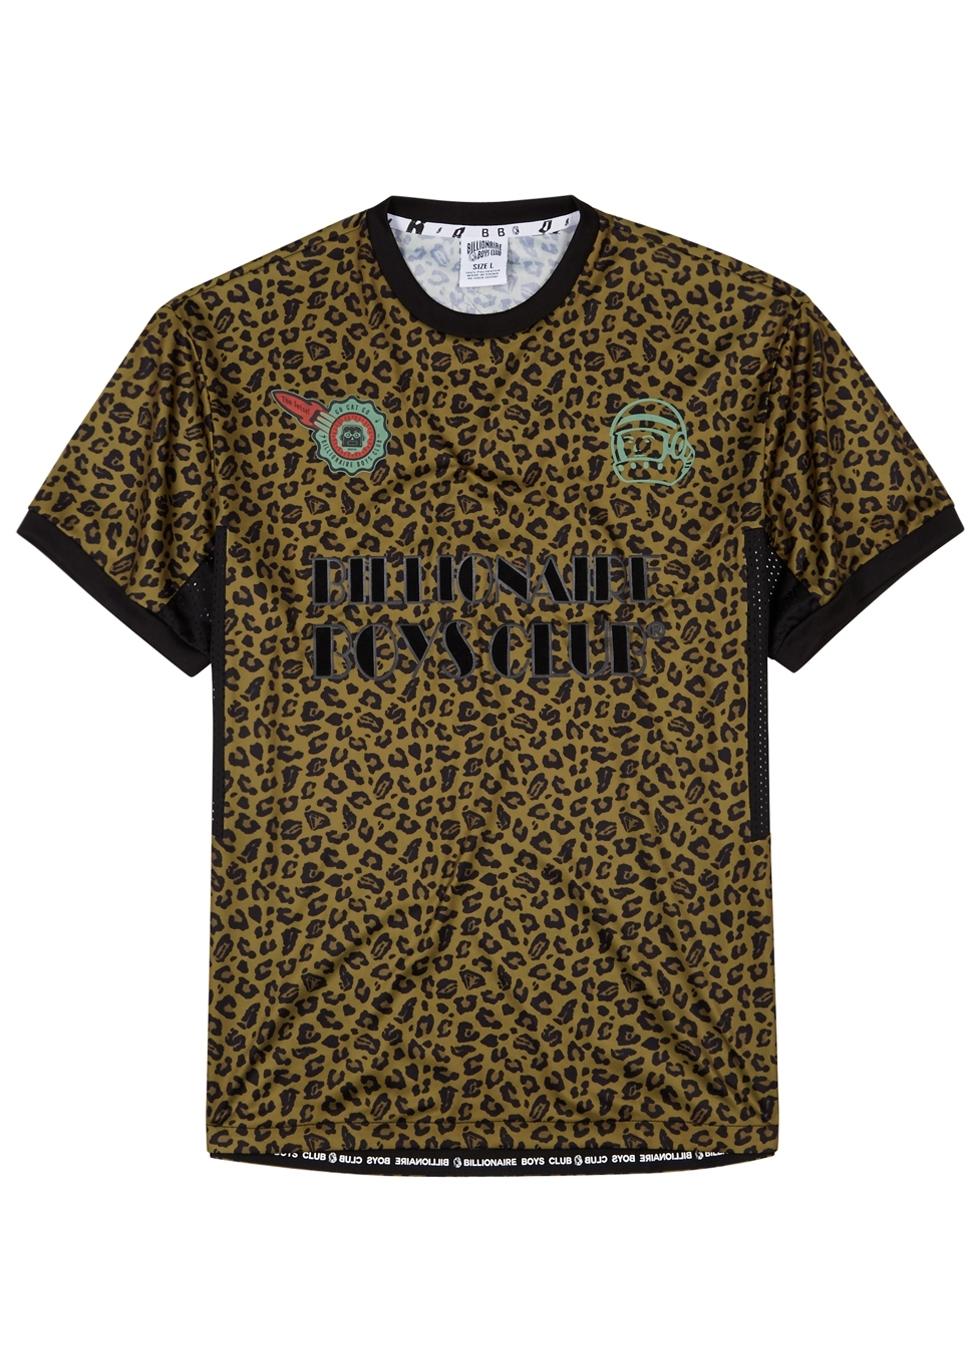 f25490036 Billionaire Boys Club Overdye Digi Camo cotton T-shirt - Harvey Nichols